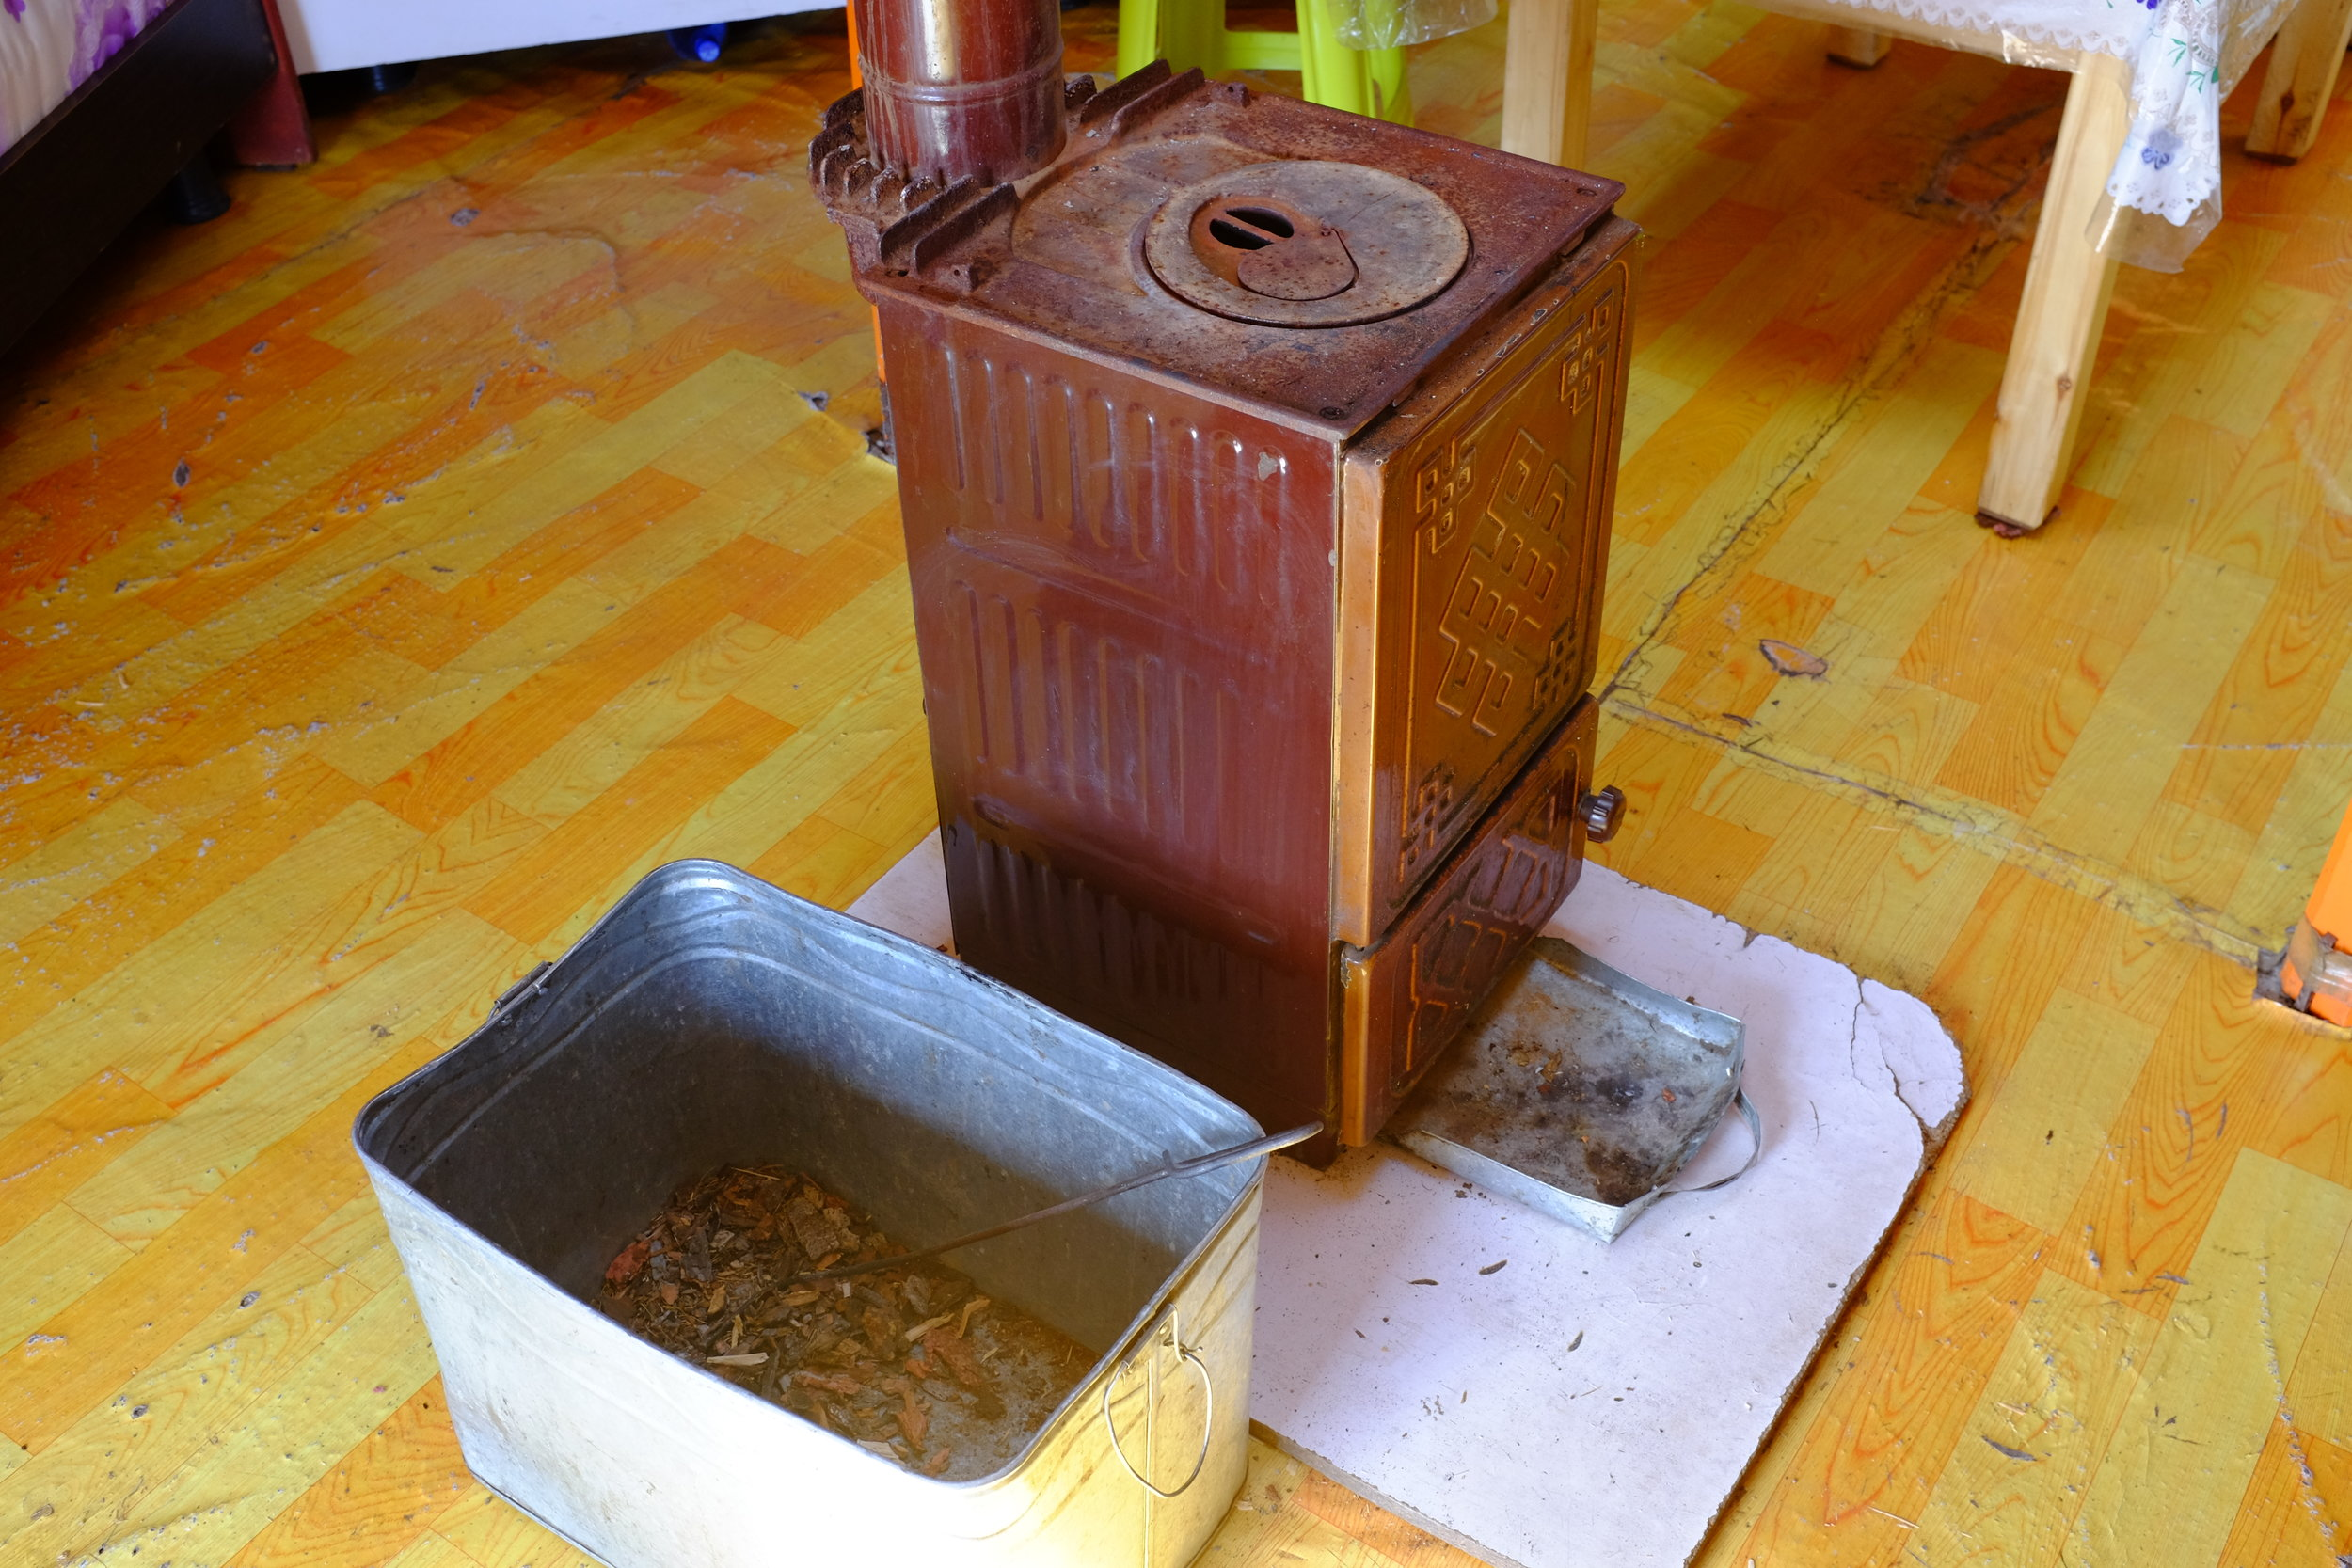 ger inside stove